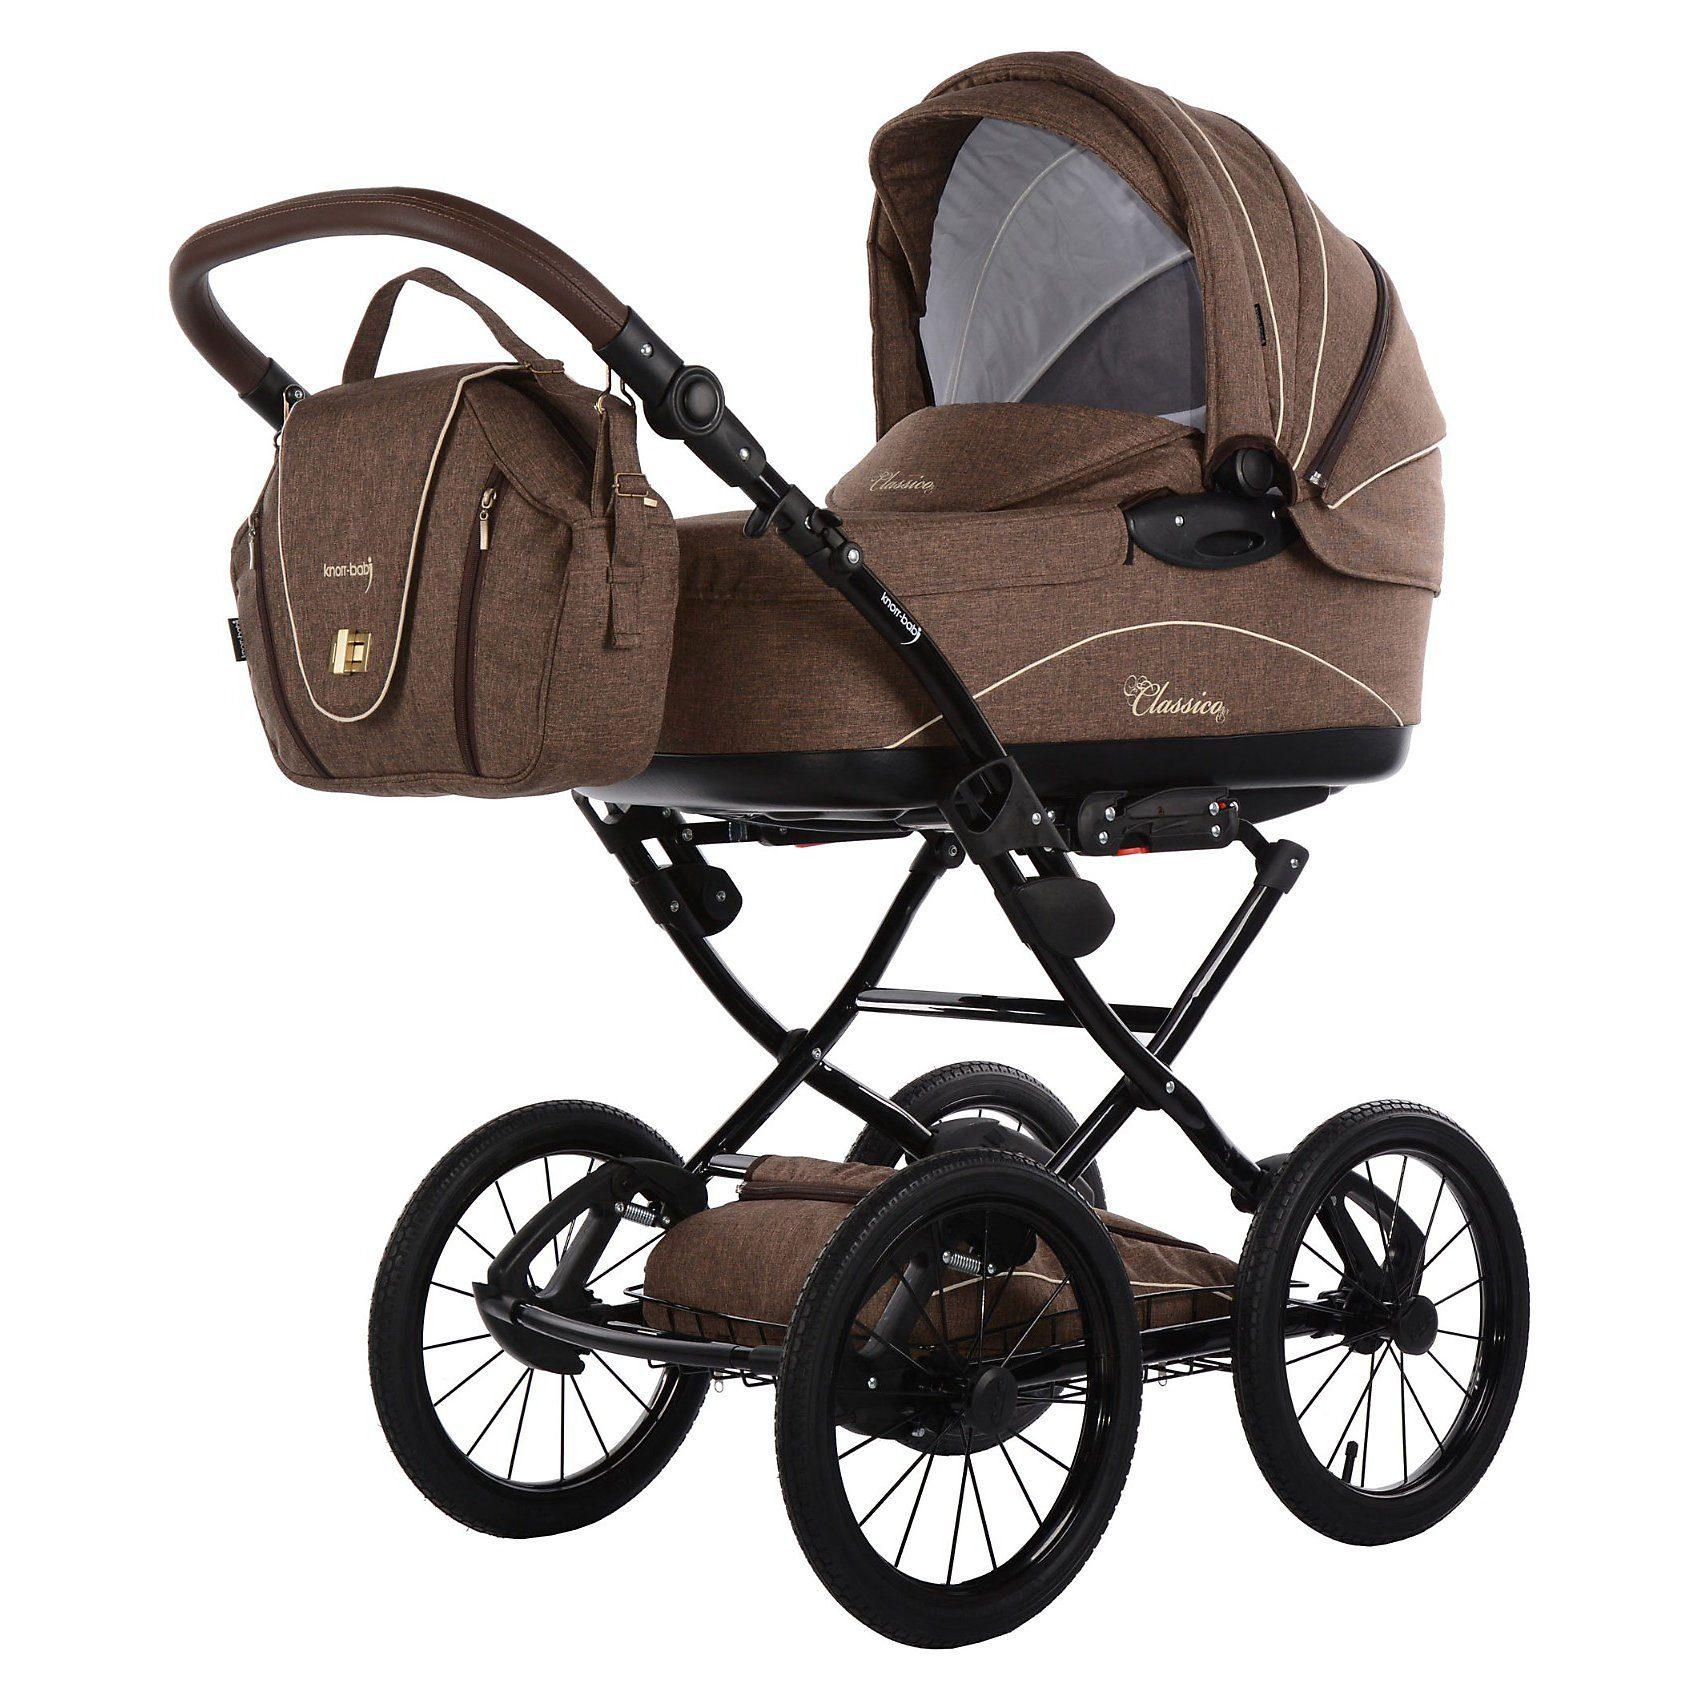 knorr-baby Kombi Kinderwagen Classico mit Wickeltasche & Handwärmer, br